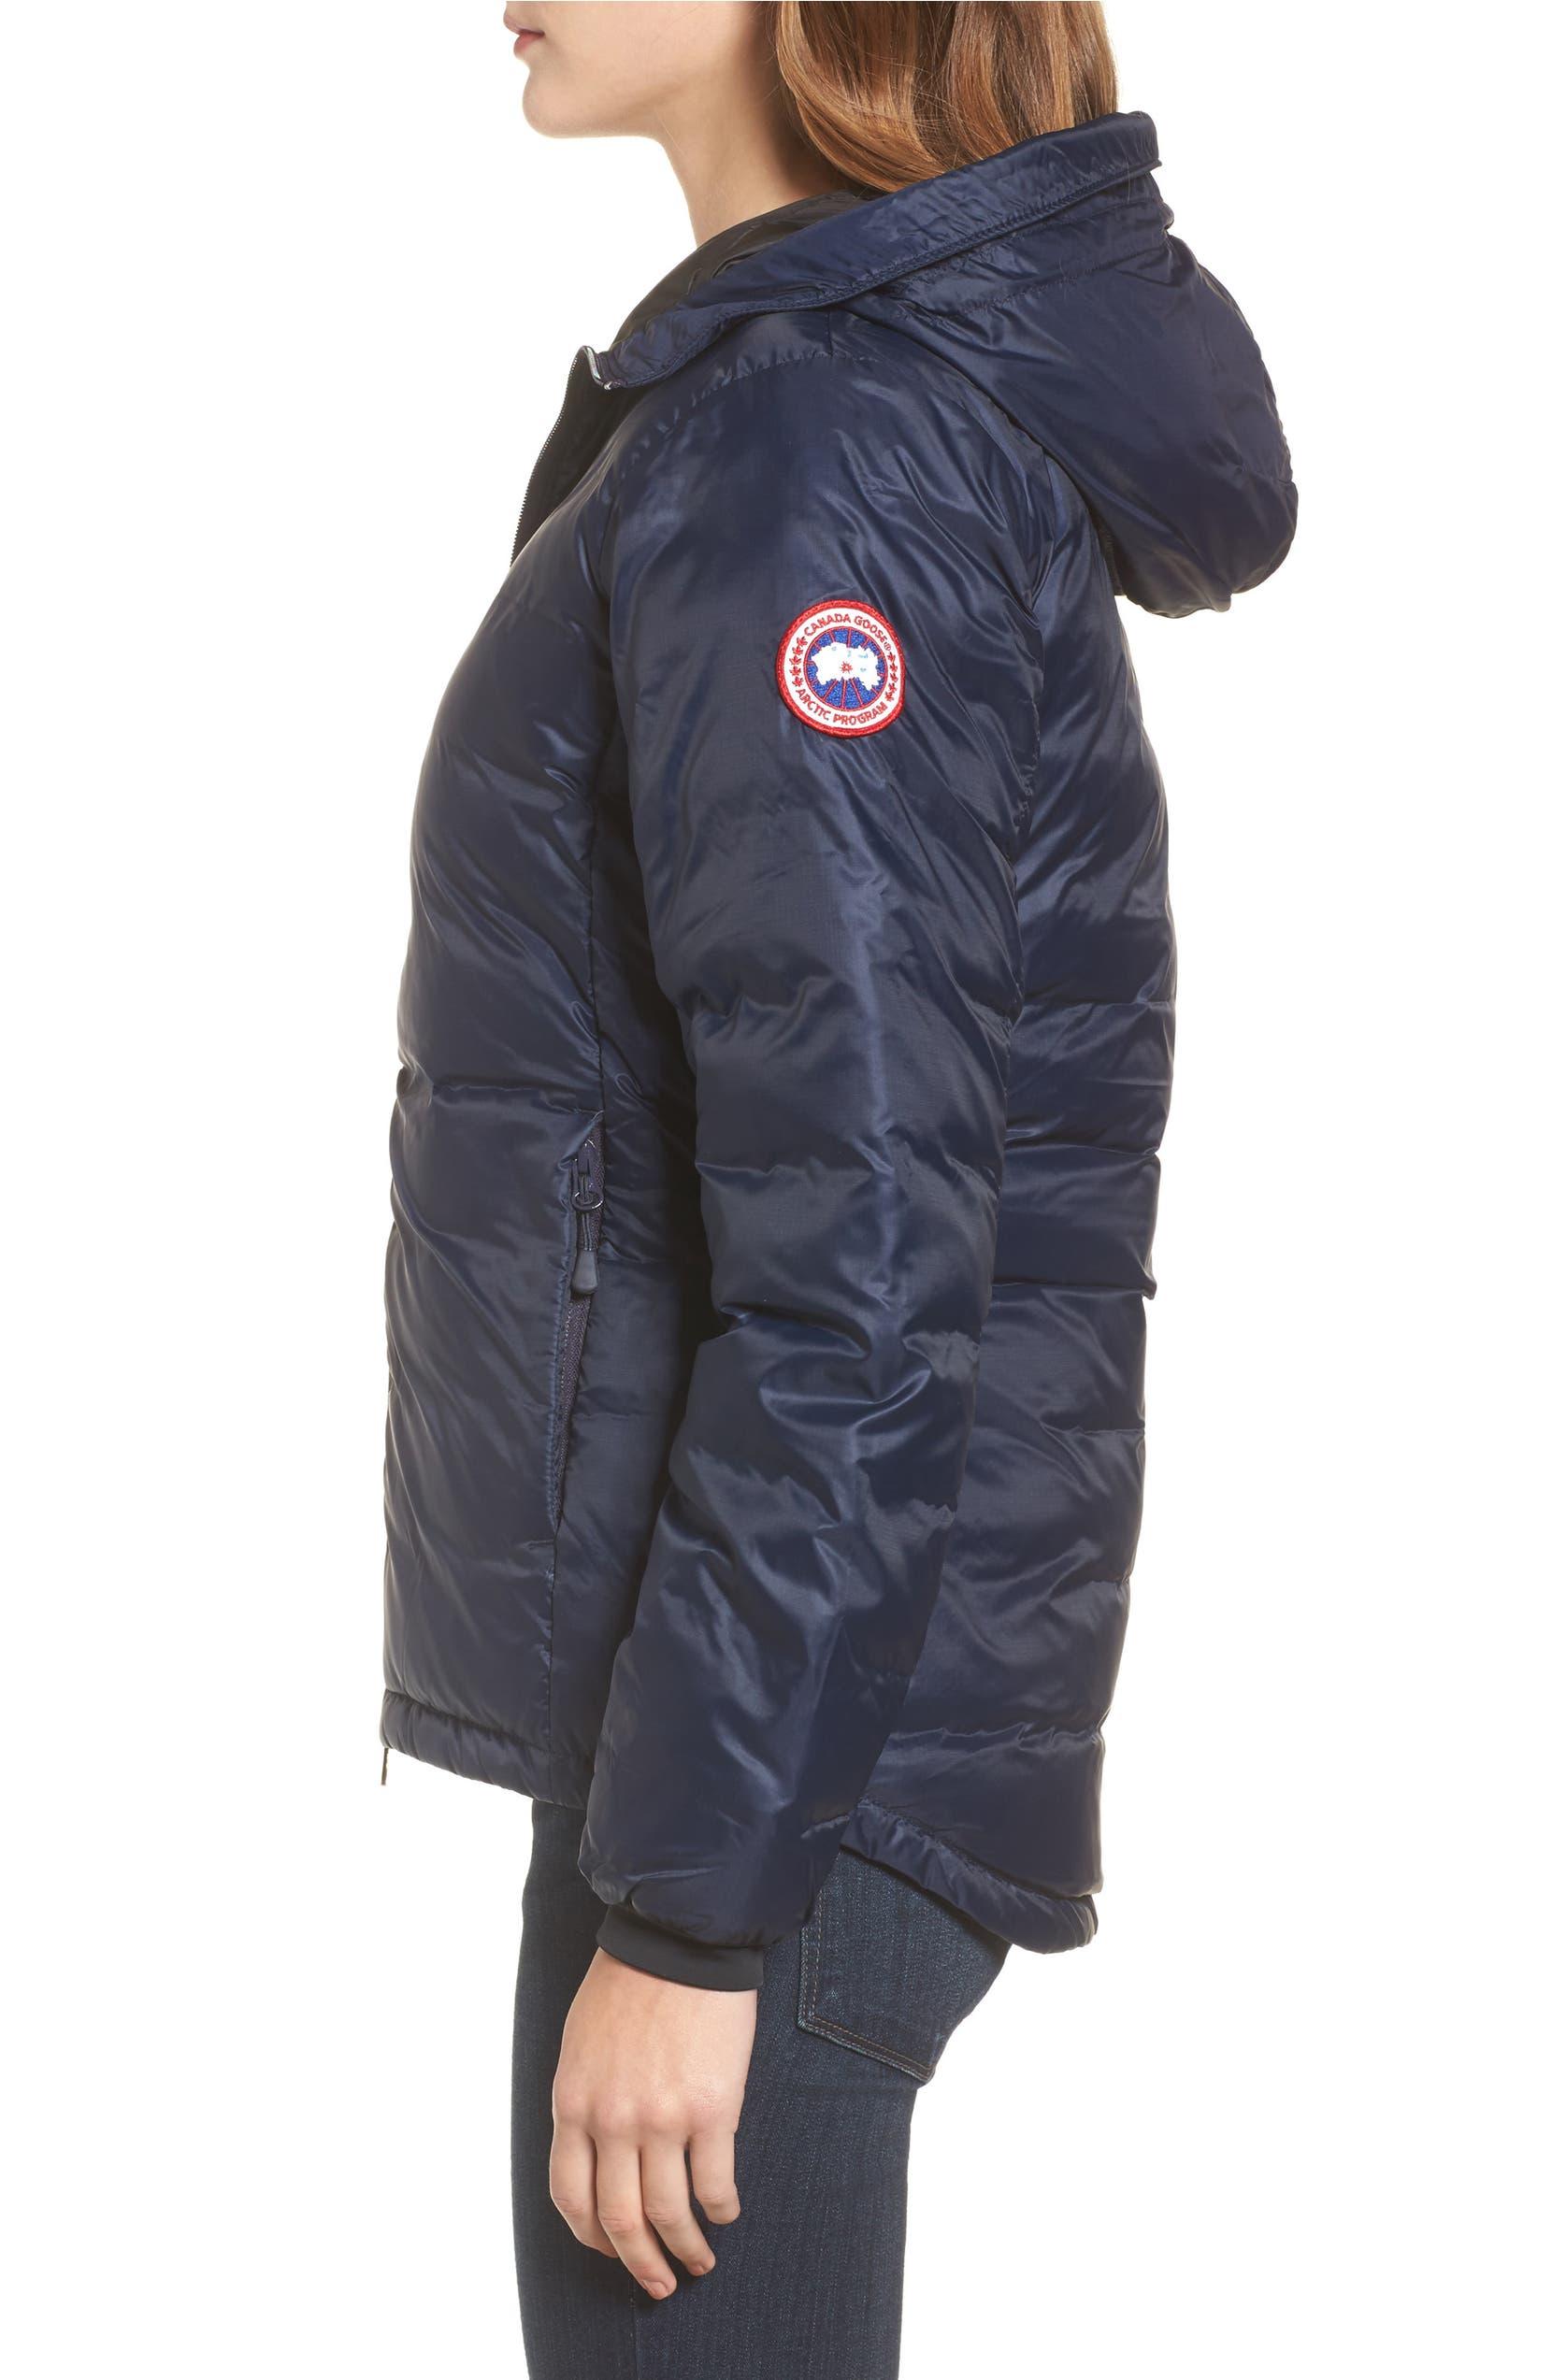 ... Women Warm Camp Down Hoody Jacket Snow Canada Goose Camp Down Jacket  Nordstrom ... ab1323debd